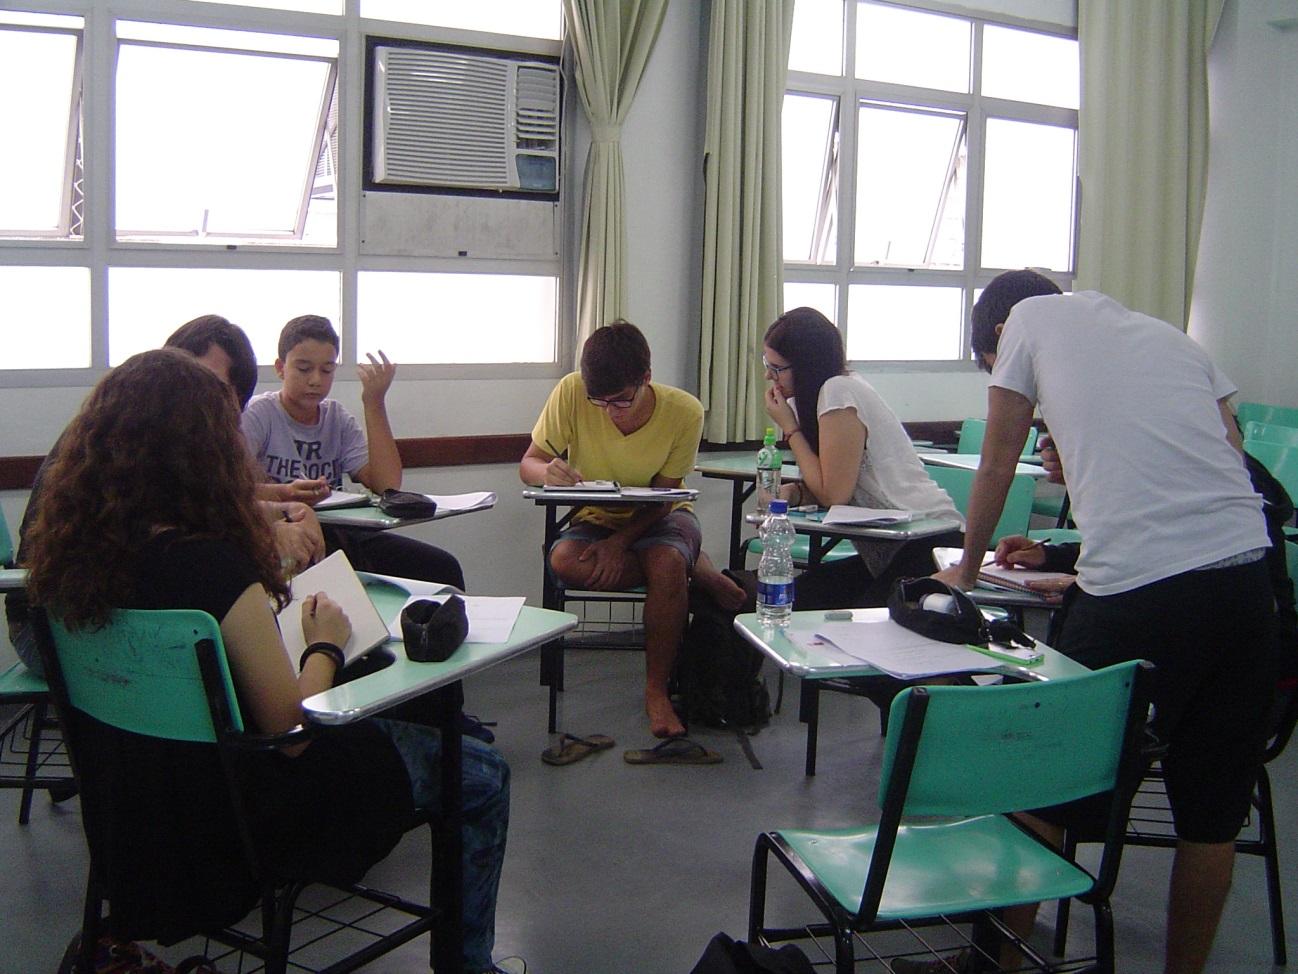 orientacoes_de_estudo_de_matematica_no_curriculo_da_1_serie_004